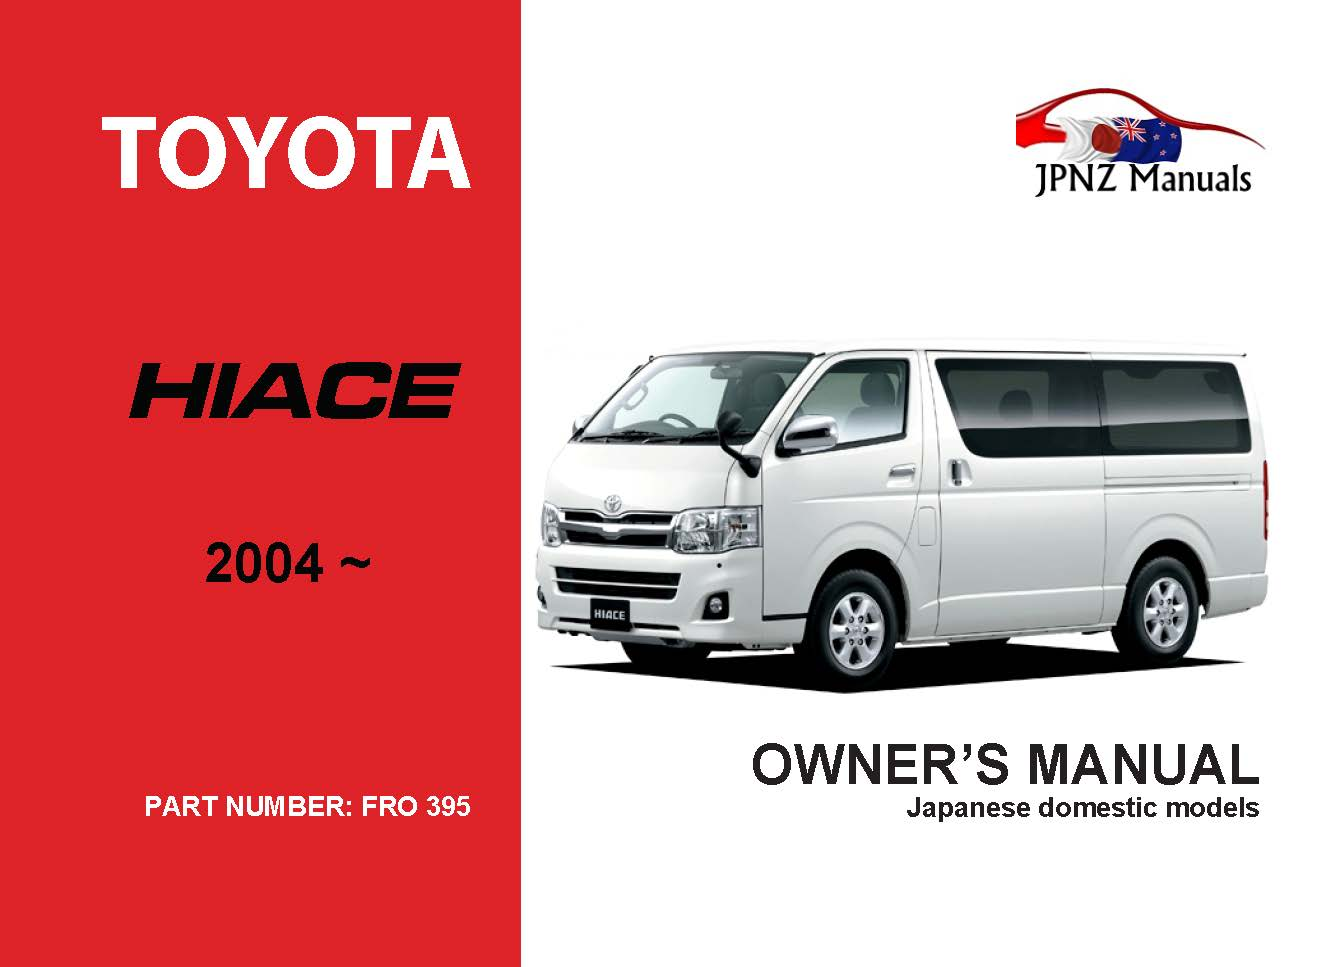 Toyota – Hiace owners manual   2004 – present